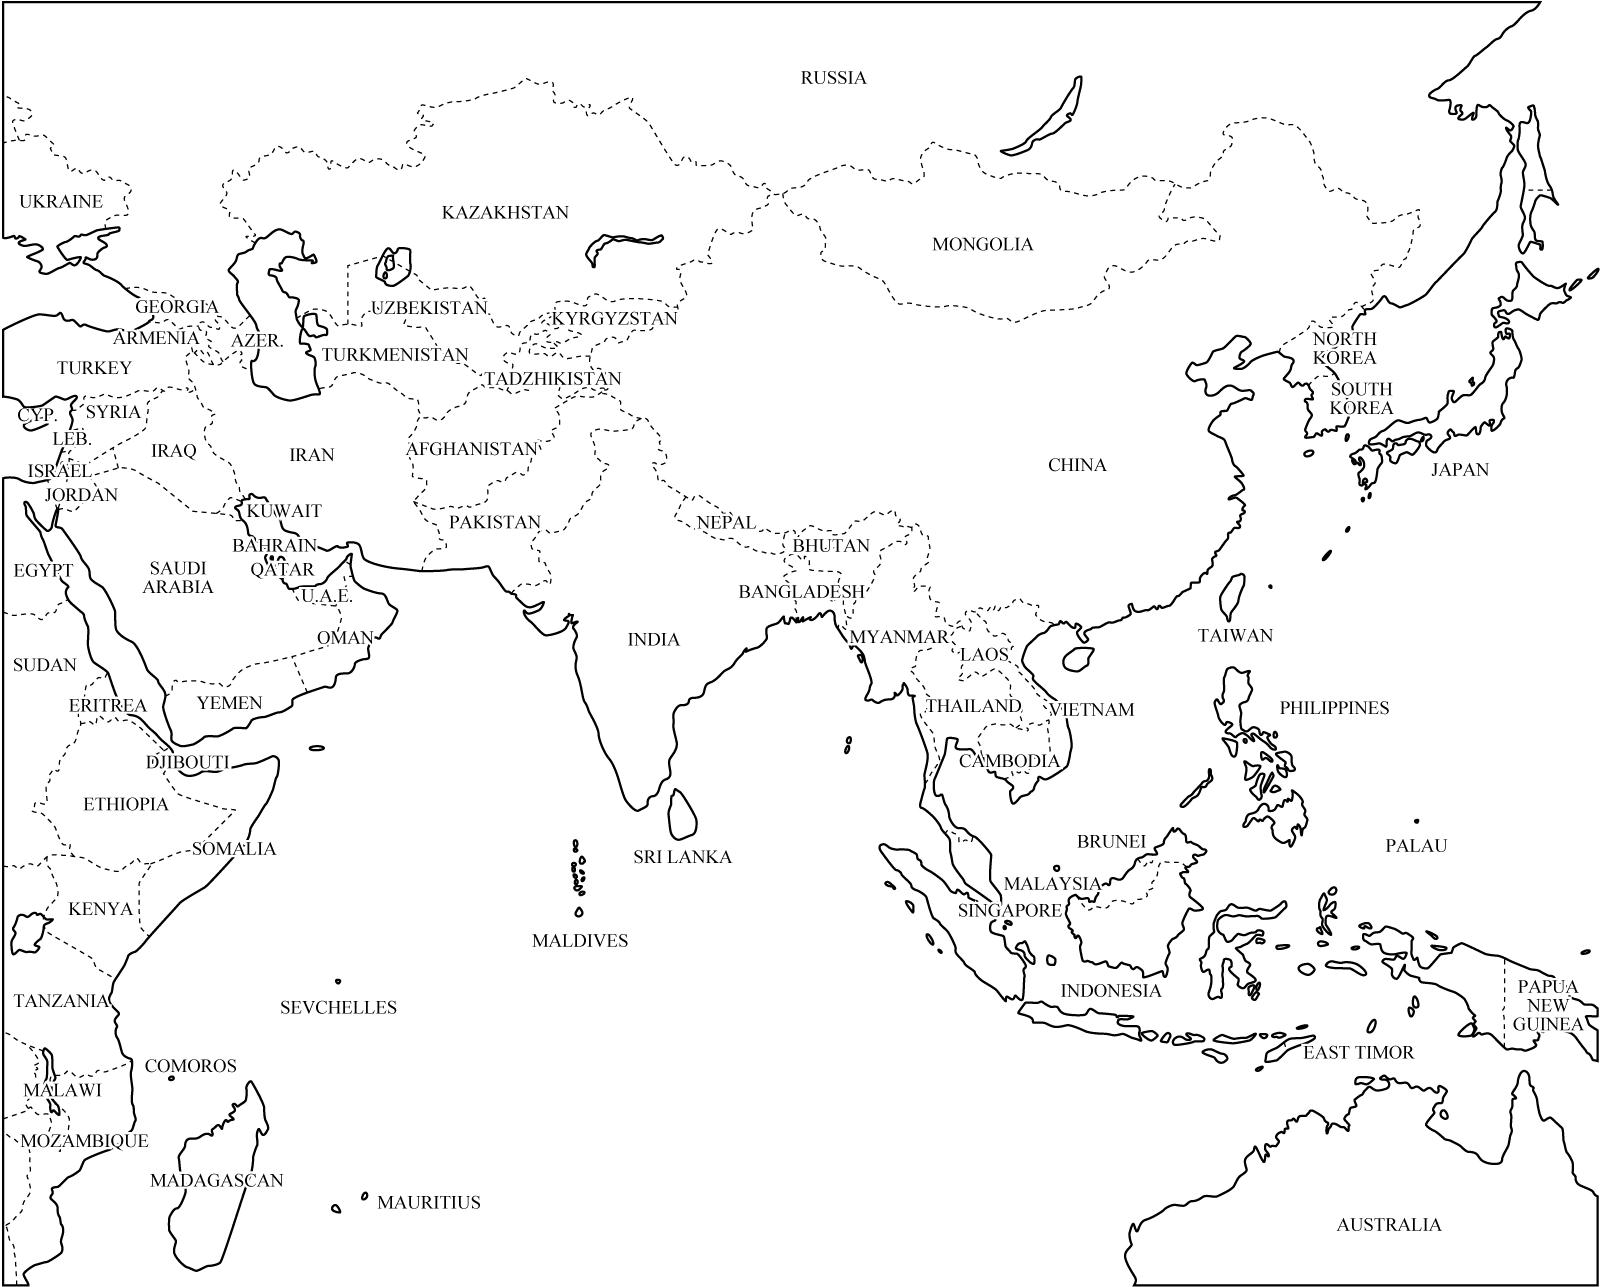 Mapa de países de Asia. Freemap